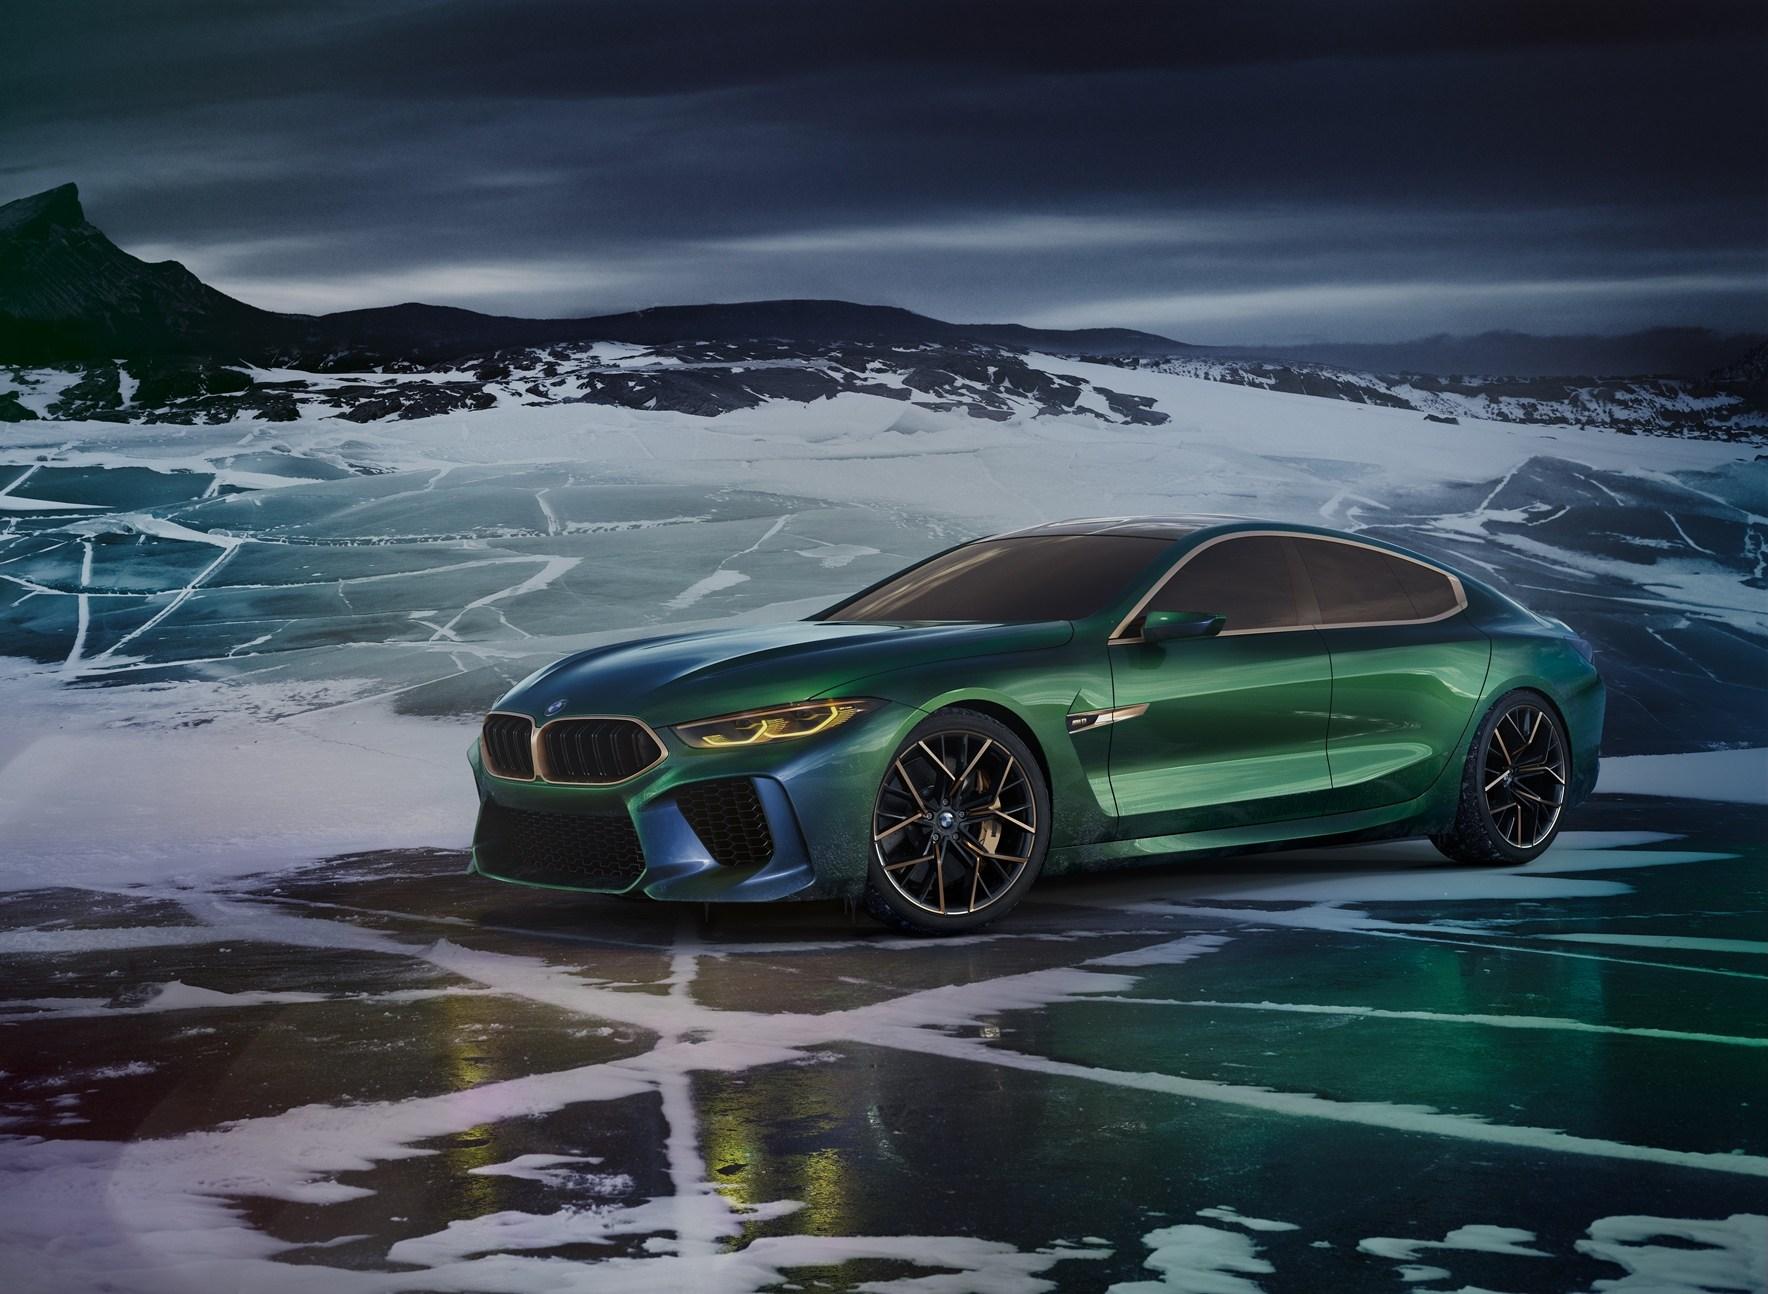 BMW Concept M8 Gran Coupe: Έμφαση στην πολυτέλεια